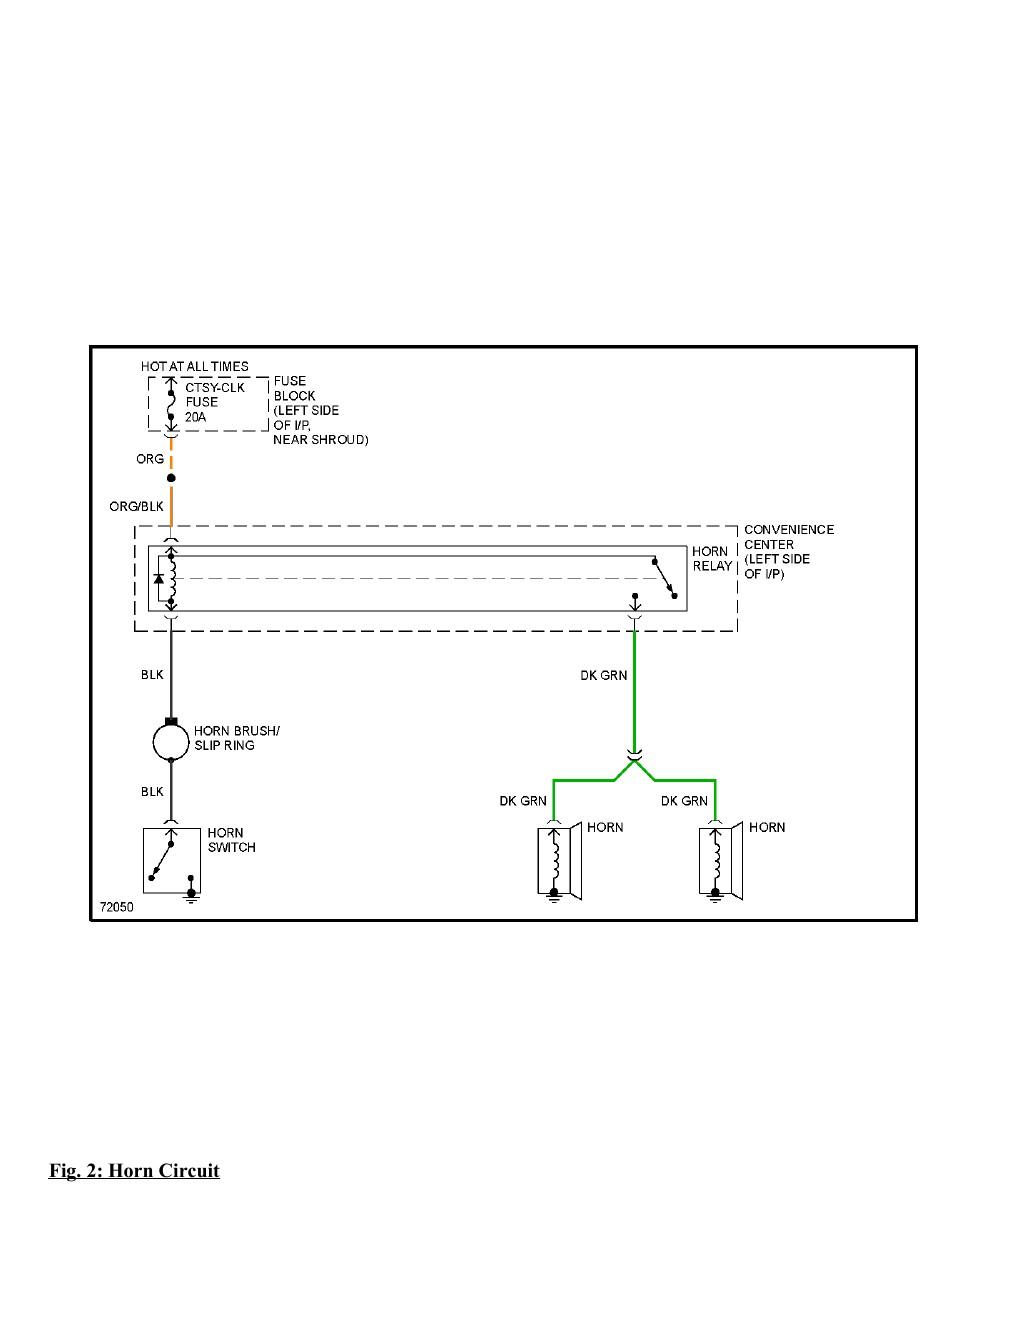 medium resolution of 1995 chevy monte carlo wiring diagram 86 monte carlo fuse box diagram 2001 monte carlo fuse